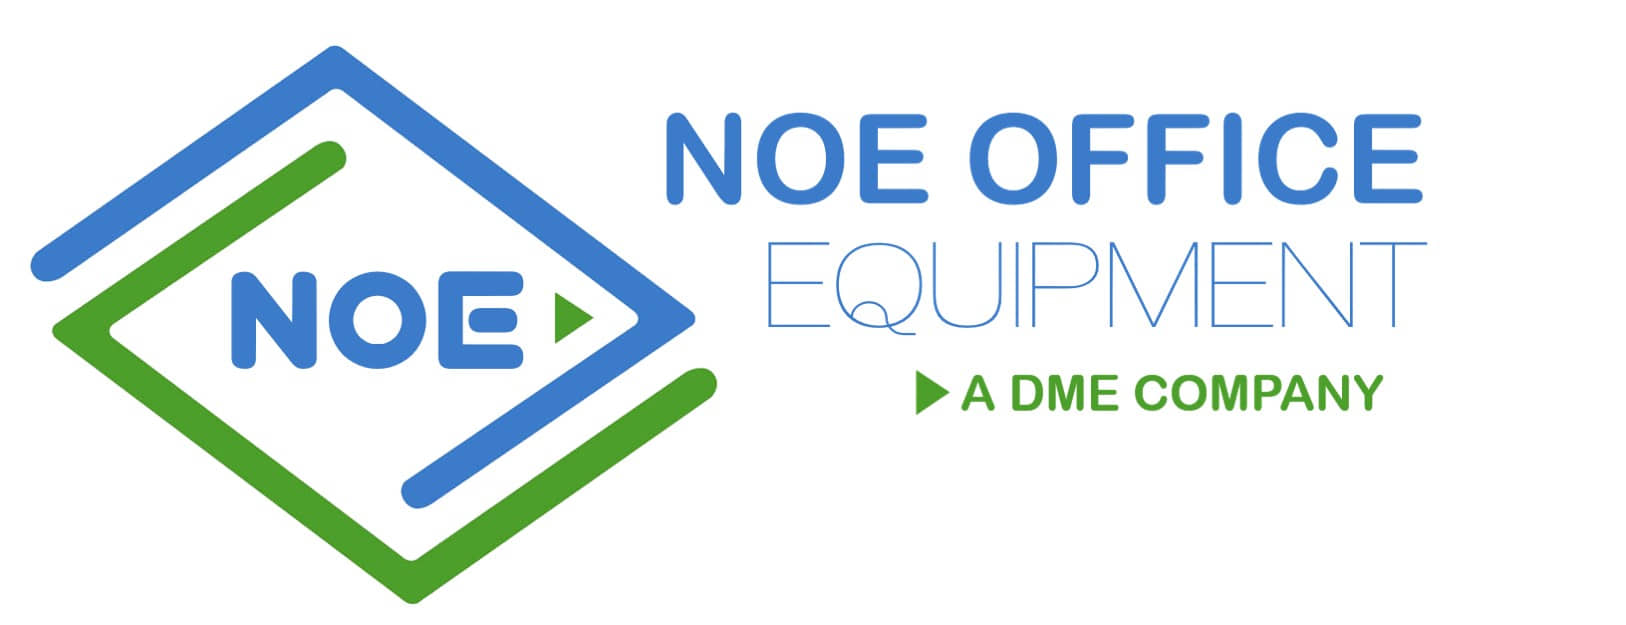 NOE office logo